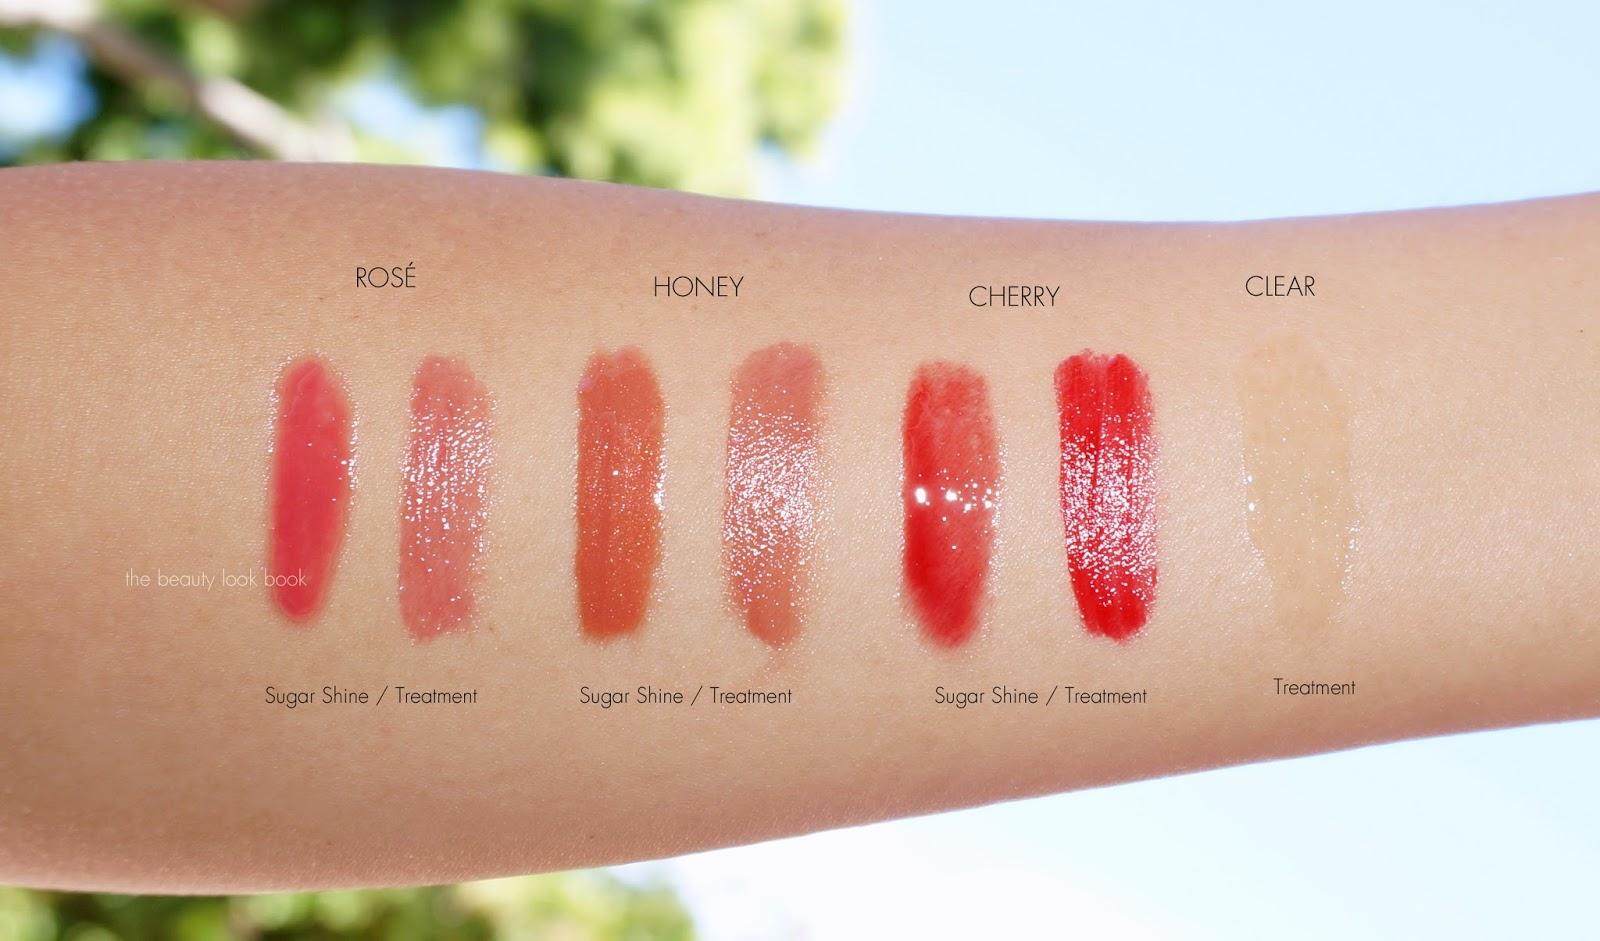 Fresh Sugar Lip Treatments (kind of a letdown) | Floraful |Sugar Lip Treatment Cherry